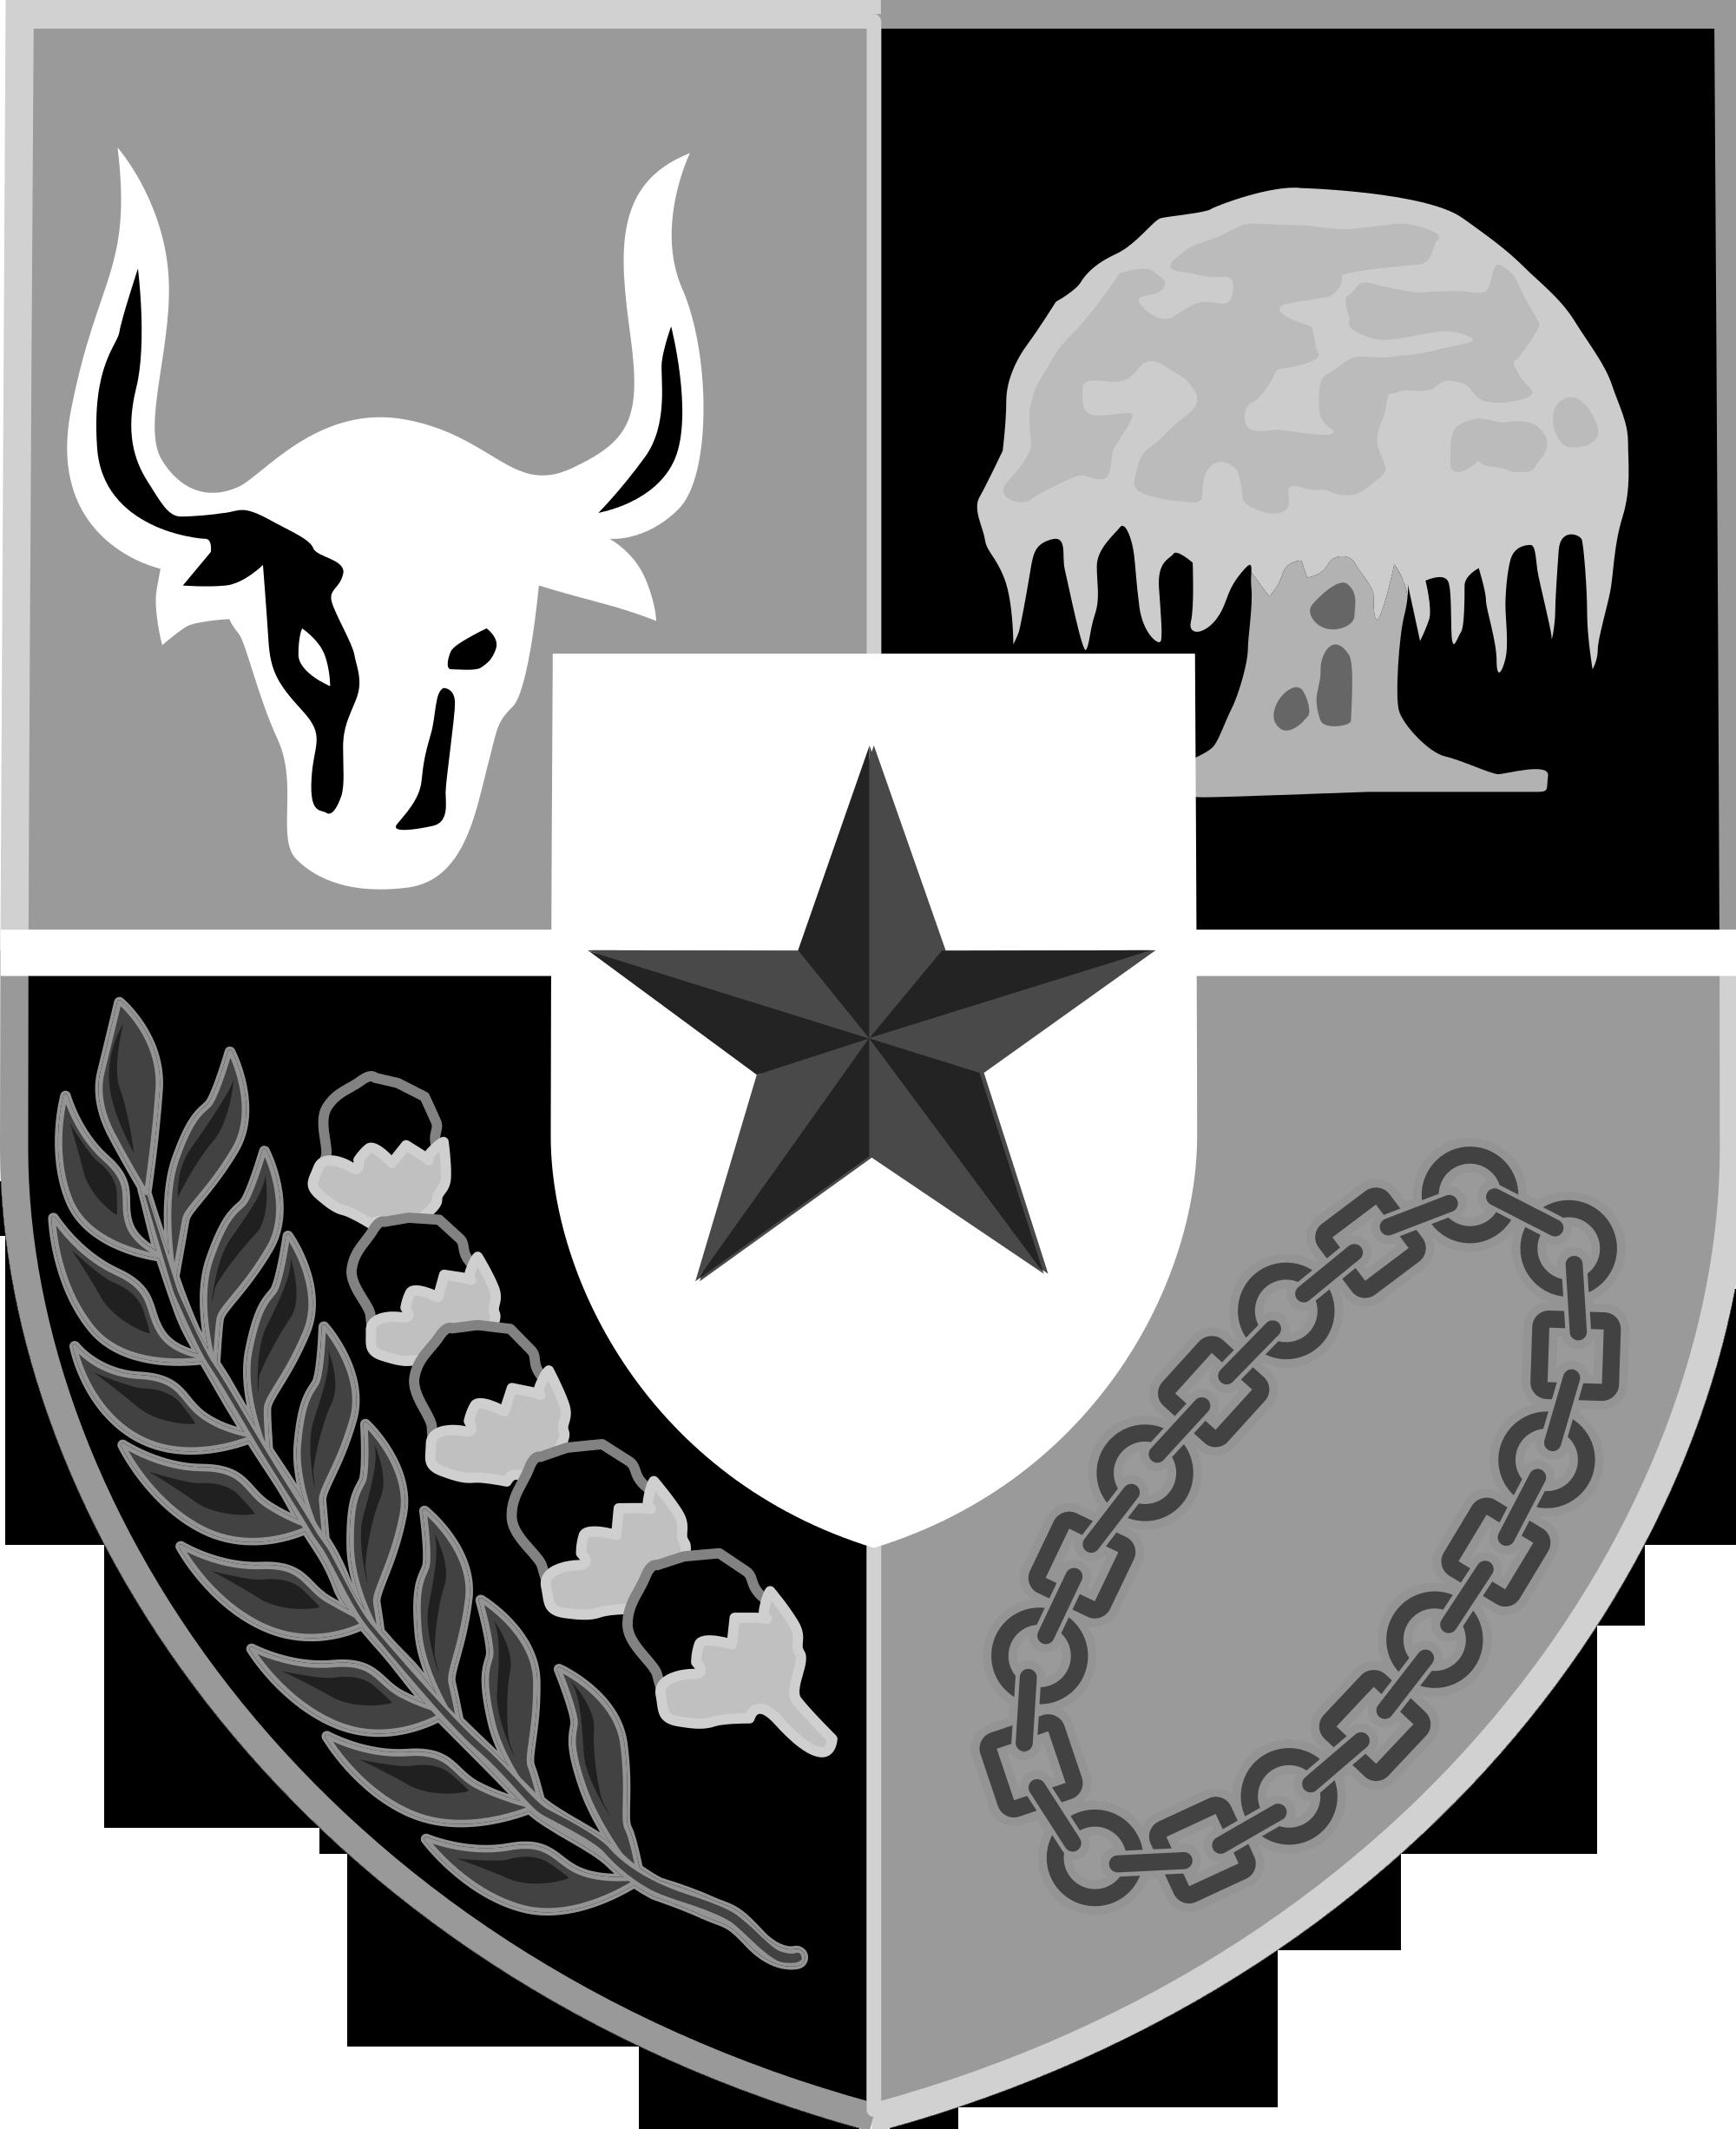 The Five Foundations' Emblem